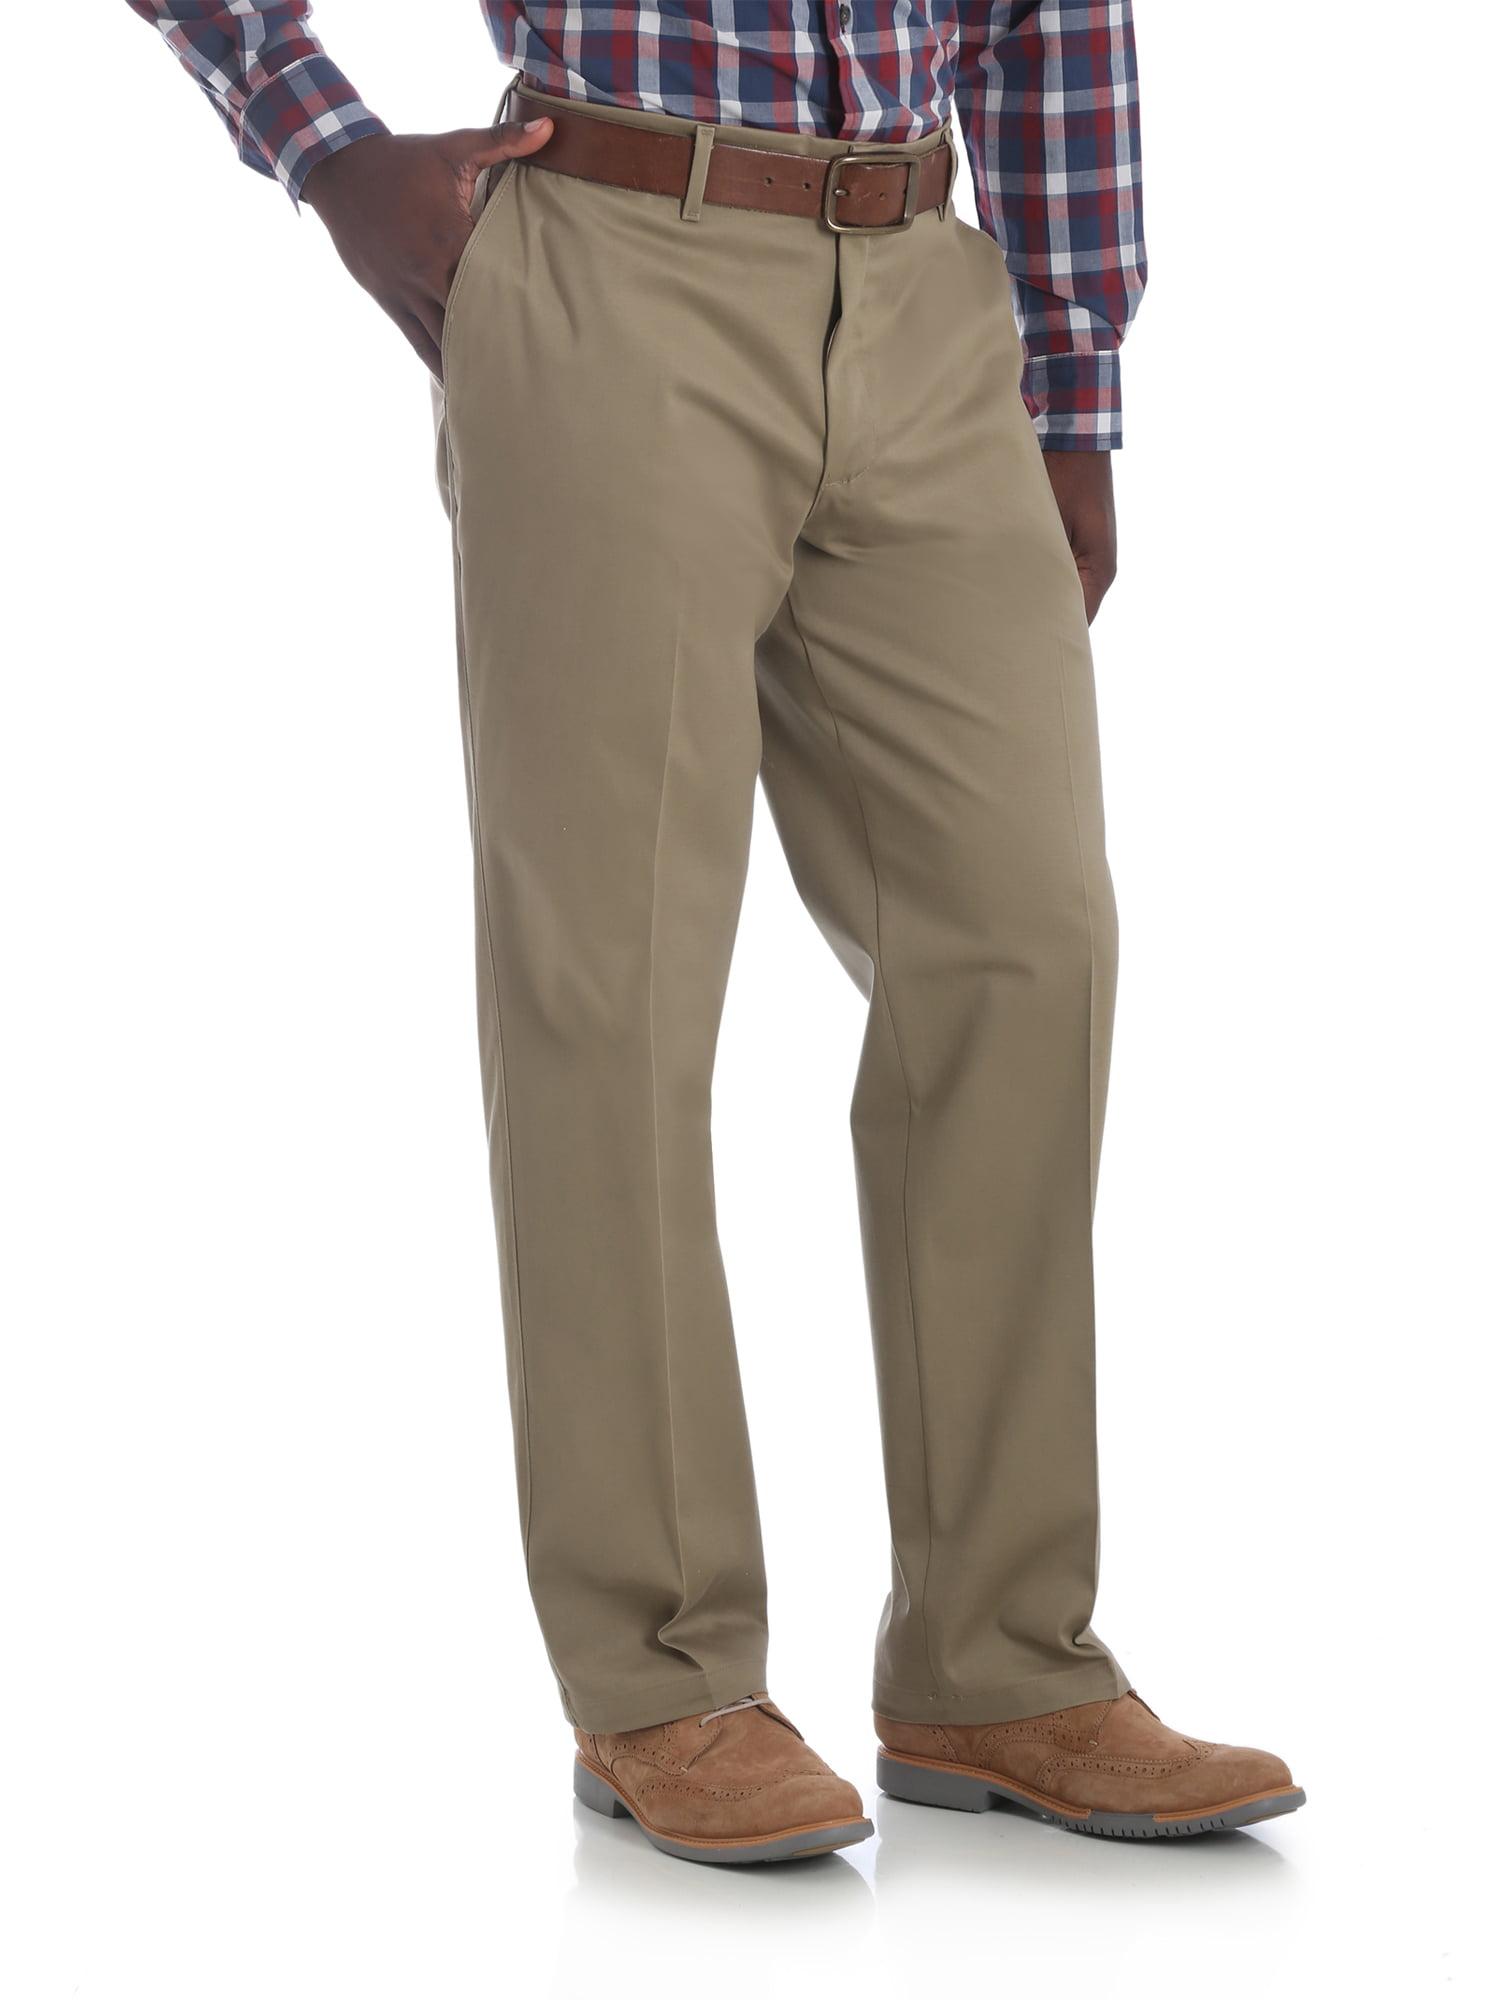 NEW George Men/'s Premium Khaki Flat Front Straight Fit Flex Fabric Dress Pants